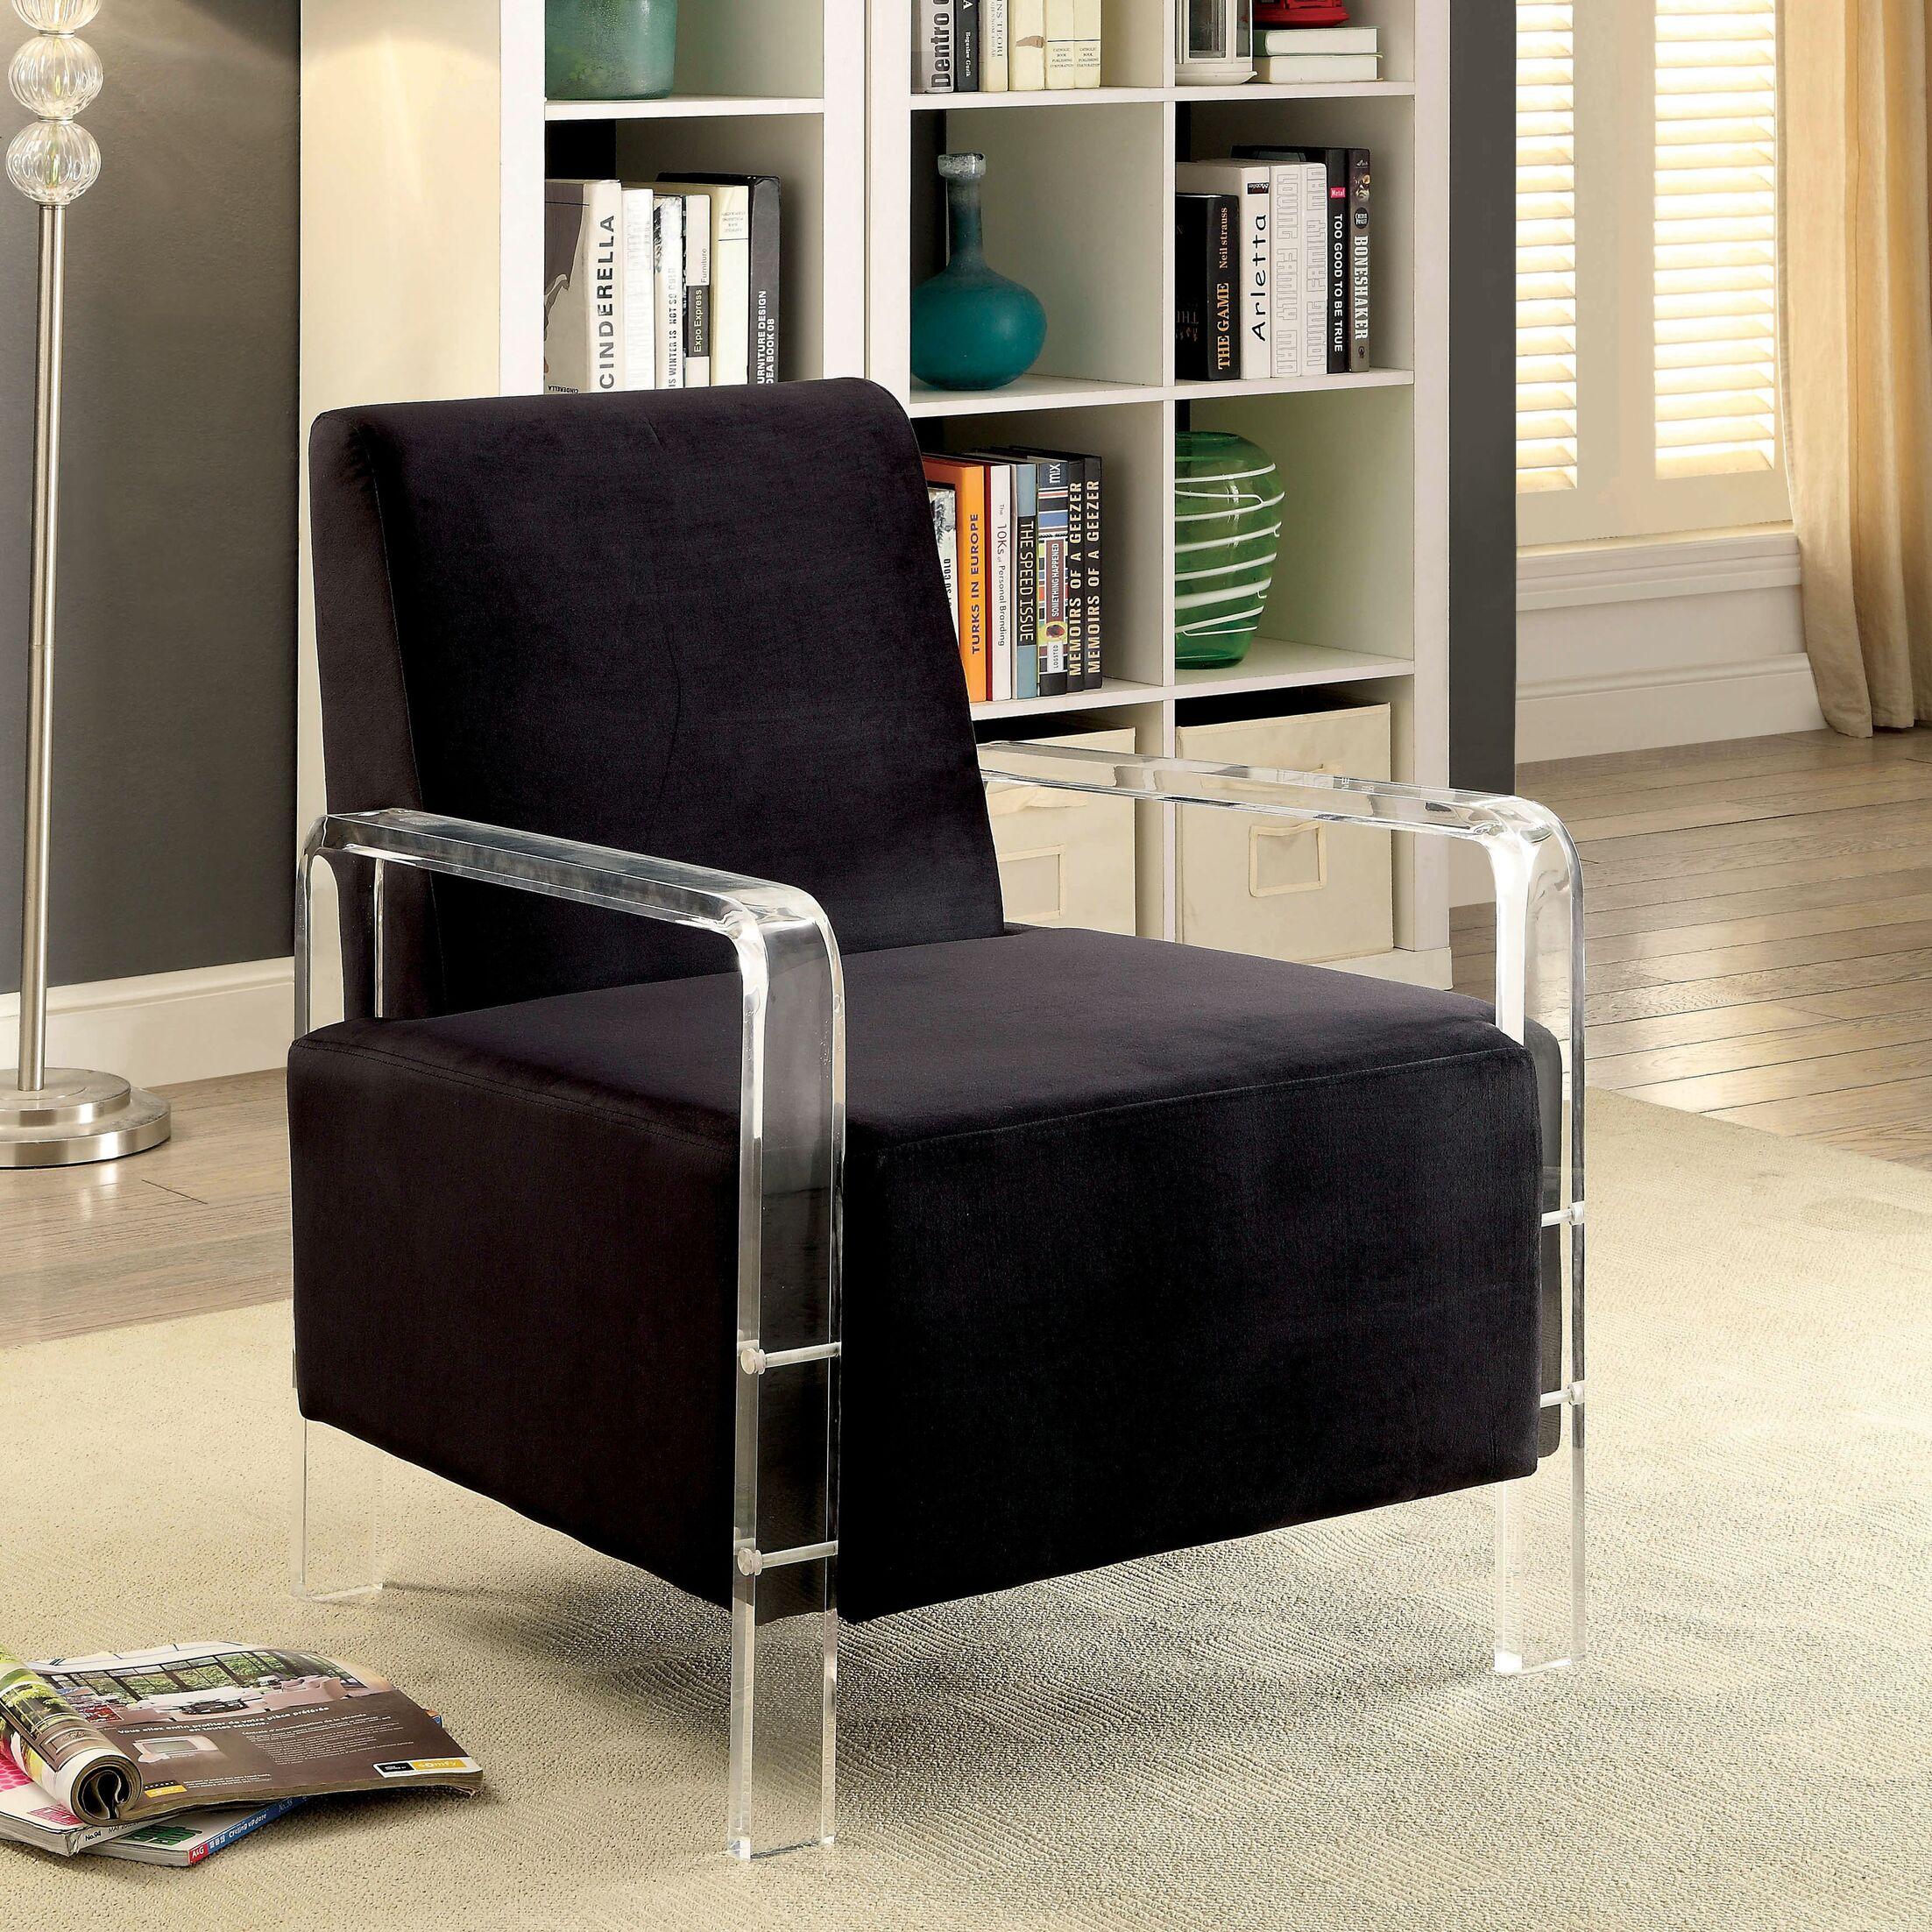 Dagostino Armchair Upholstery: Black